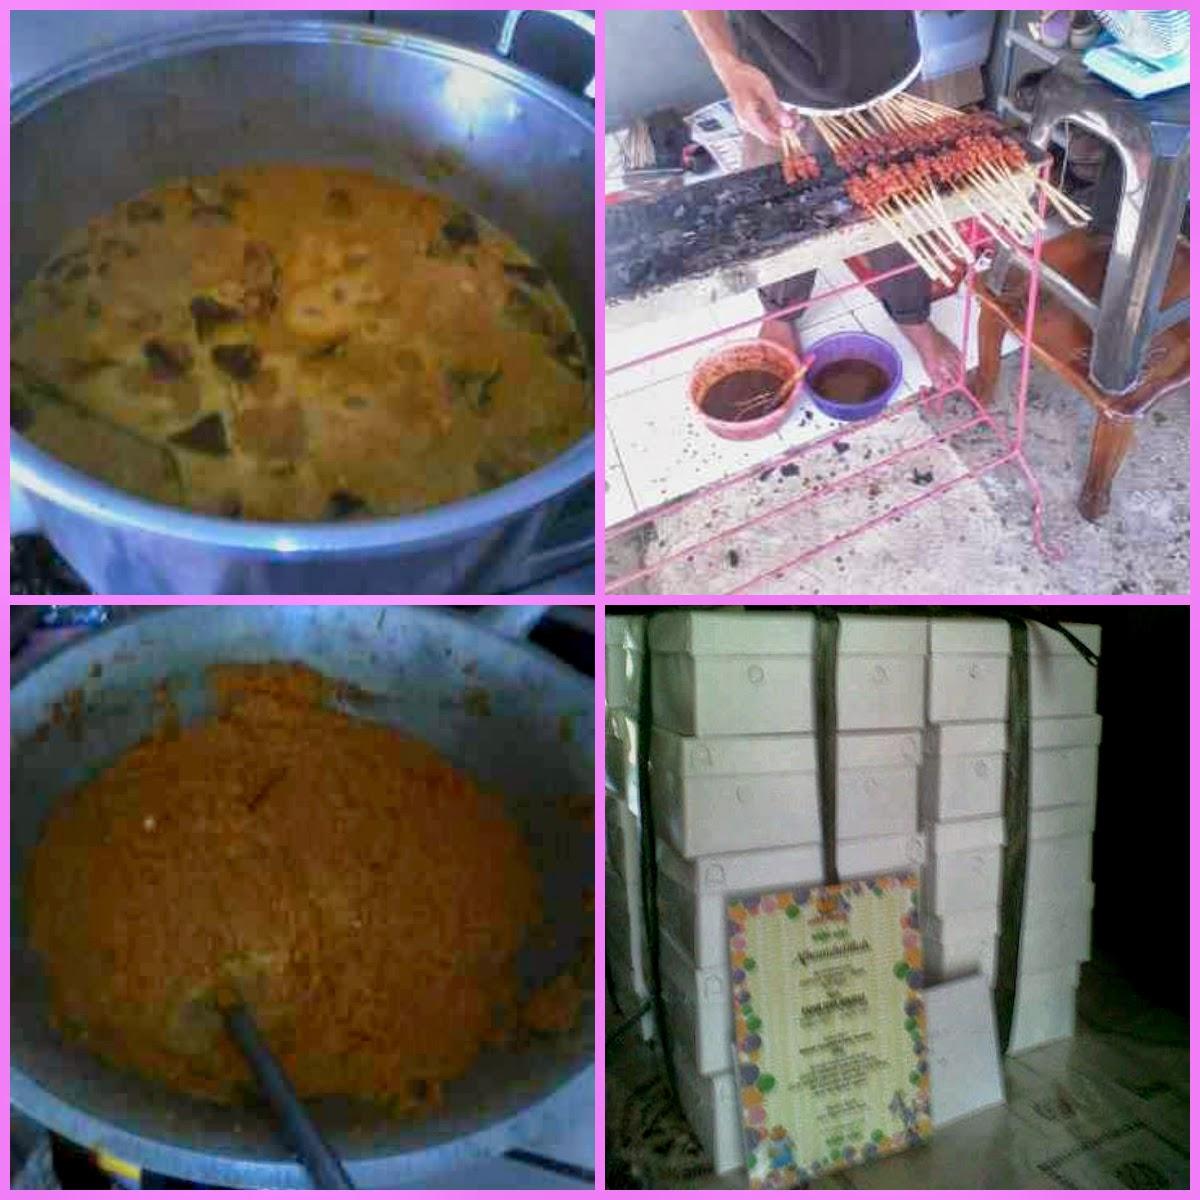 jasa aqiqah di jakarta</a> <br /> Paket Aqiqah Di Jakarta Tahun 2014 Alhamdulillah segala puji hanya milik Allah..tuhan semesta alam.selamat datang kami ucapkan. kami layanan jasa aqiqah jakarta raya yang terbaik dan termurah. menyediakan paket aqiqah yang murah dan paket aqiqah yang lengkap.jual kambing aqiqah jakarta, potong kambing aqiqah,...<br /> <br /> Layanan <b><a href=